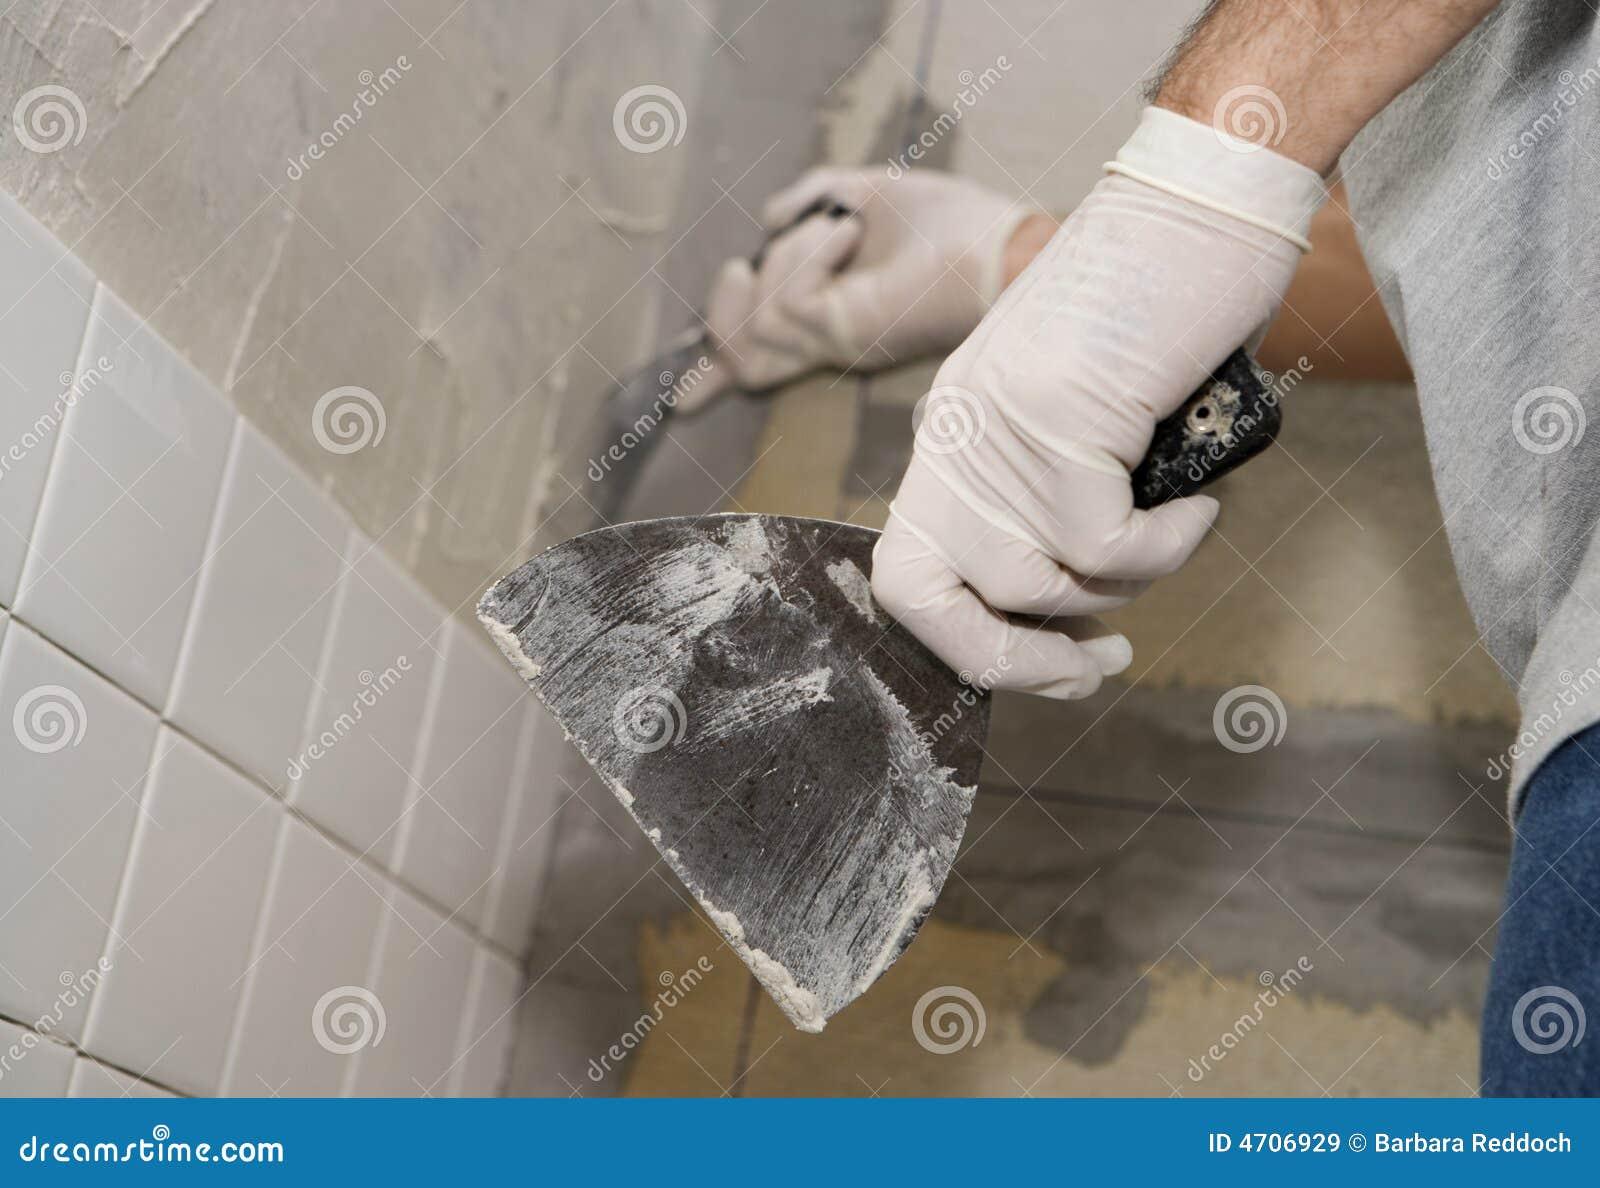 Closeup Of Man Tiling A Wall Stock Image - Image of selective, knife ...